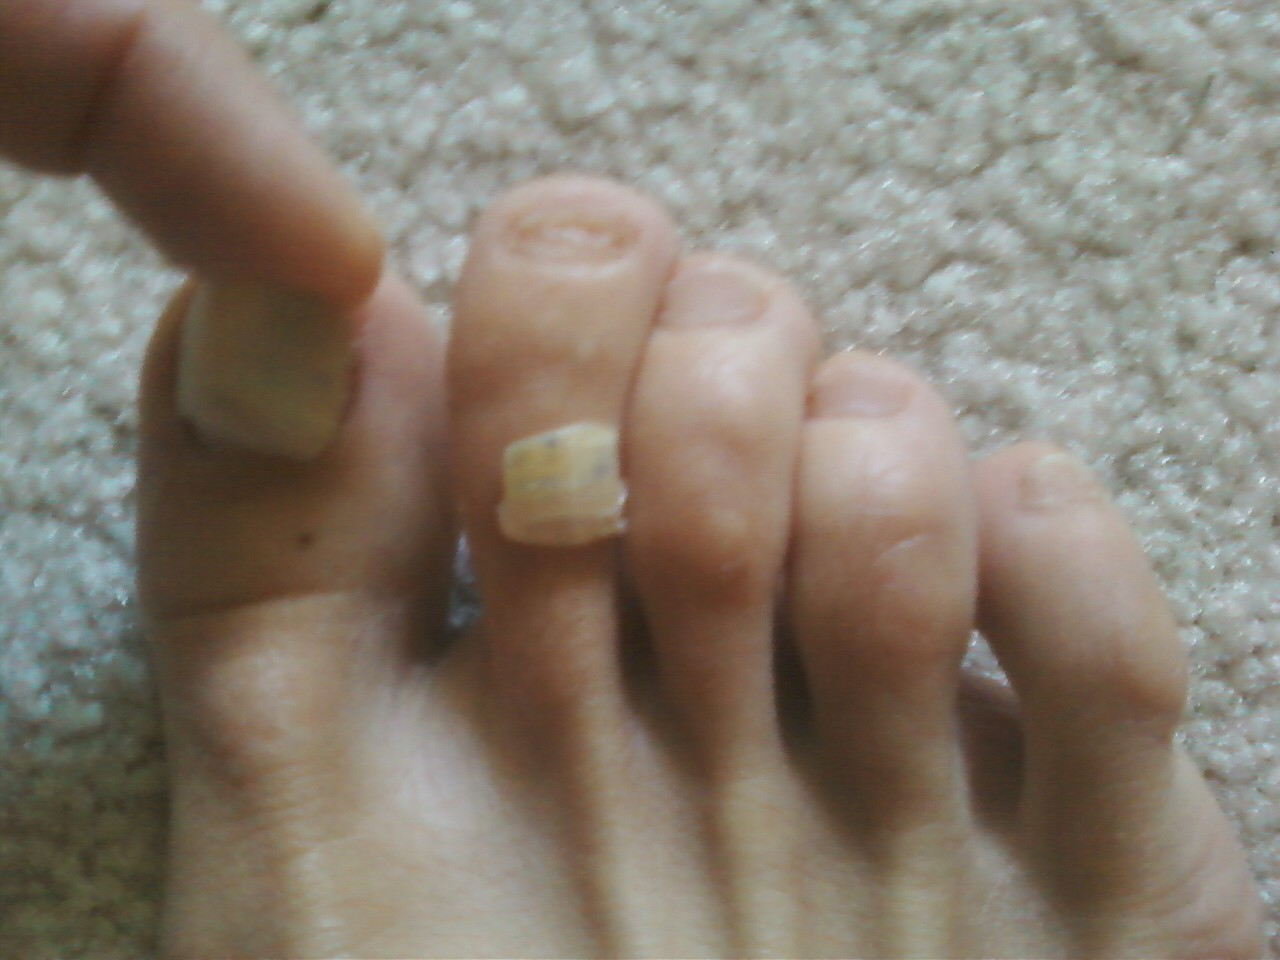 Long Fingernails and Toenails - Bing images